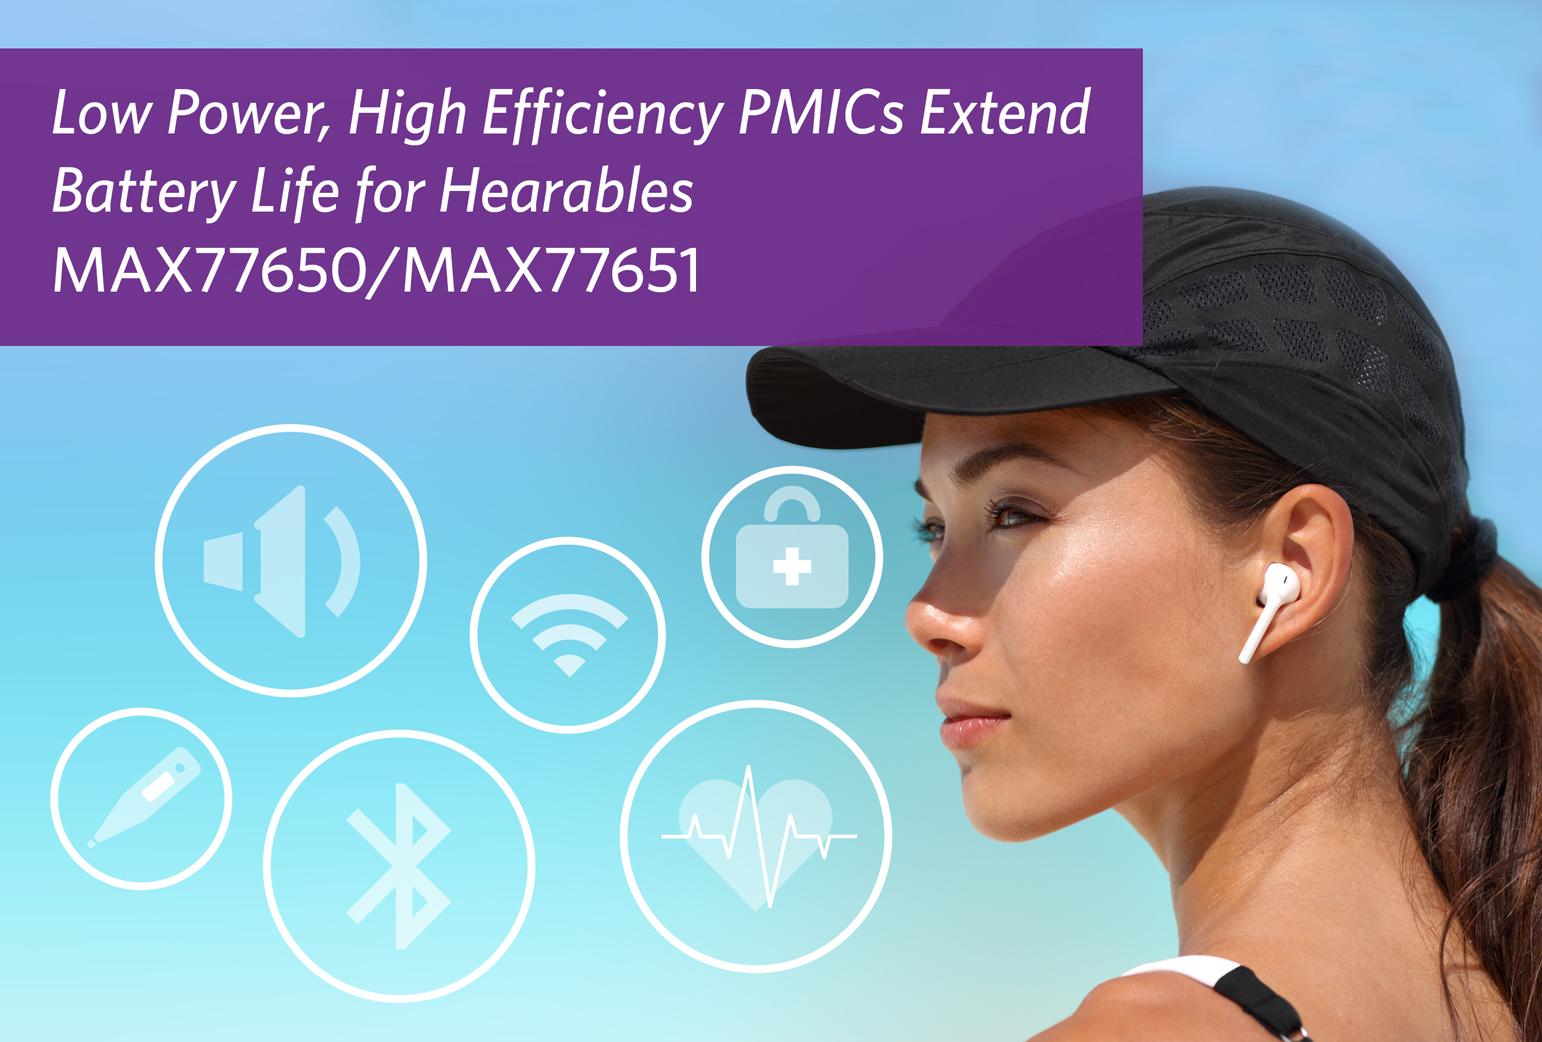 Maxim面向耳戴式和可穿戴产品推出最低功耗PMIC,体积缩小一半以上